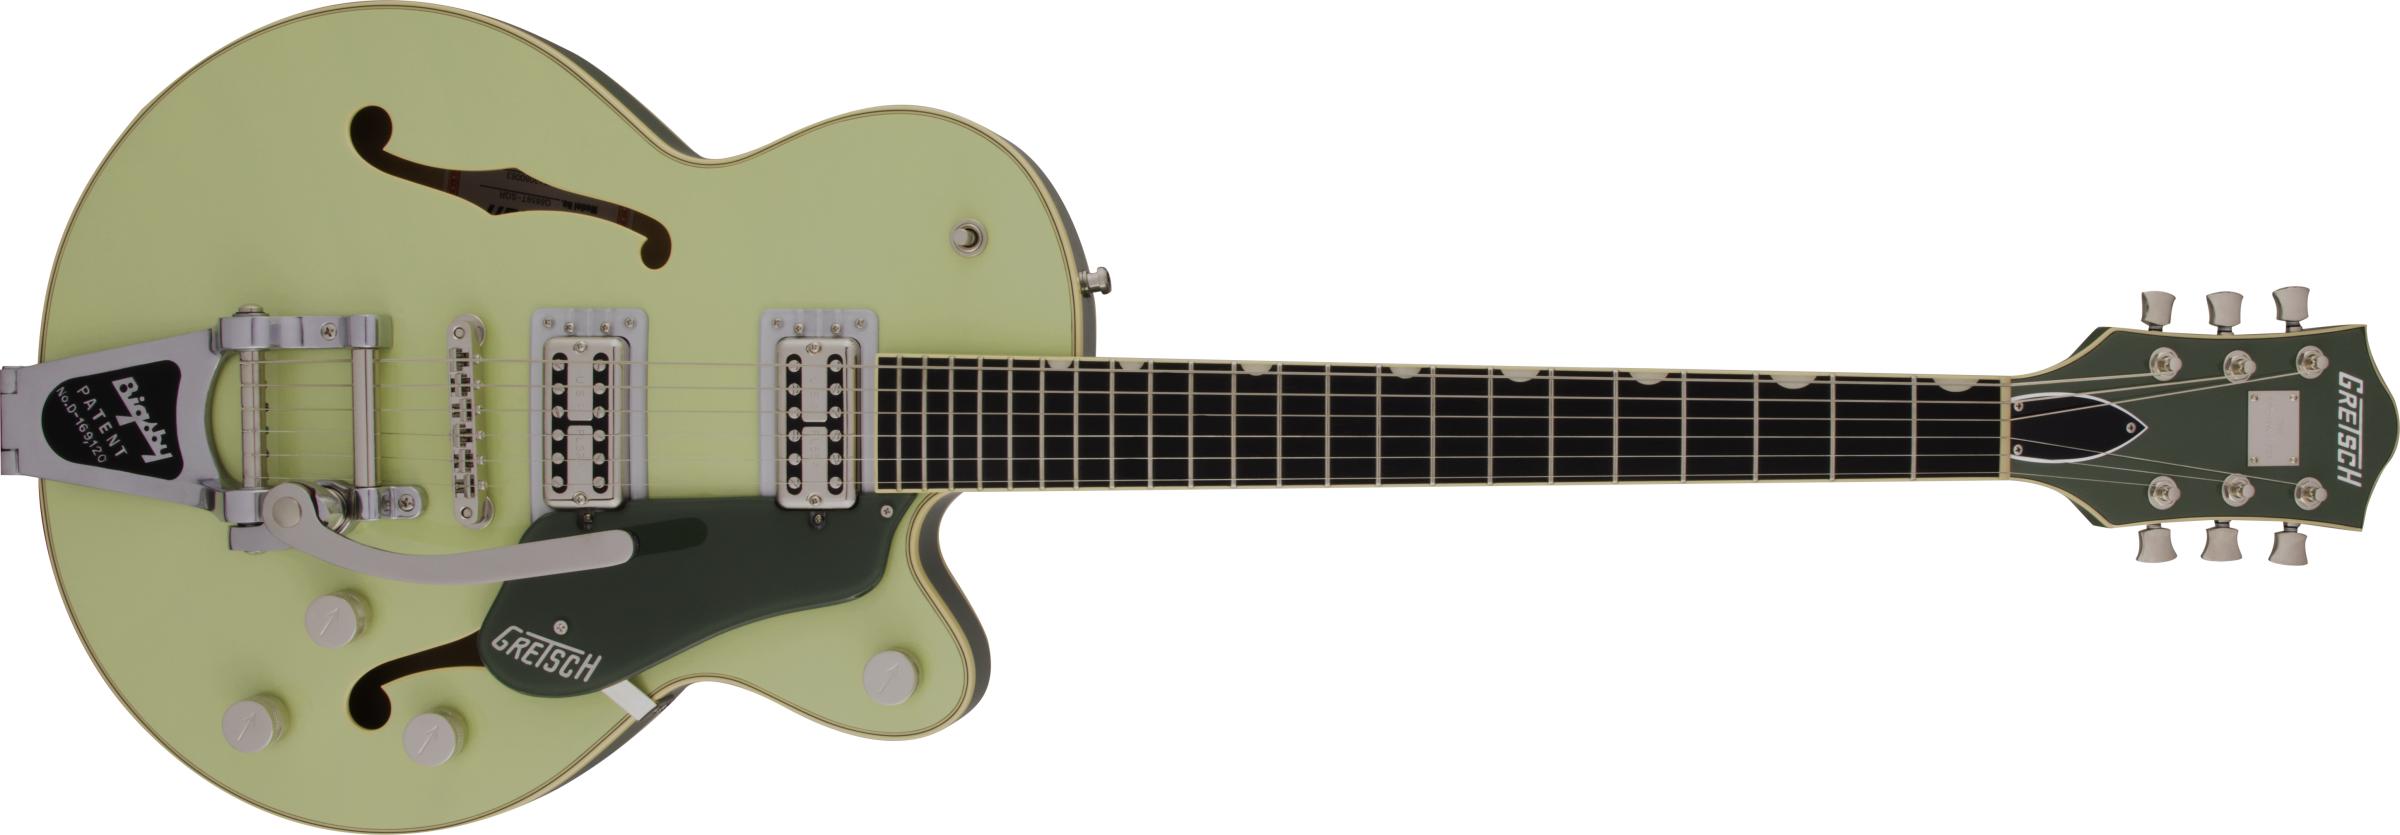 GRETSCH-G6659T-Players-Edition-Broadkaster-Jr-Center-Block-Single-Cut-with-String-Thru-Bigsby-USA-FullTron-Pickups-Ebony-Fingerboard-Two-Tone-Smoke-Green-sku-571004574